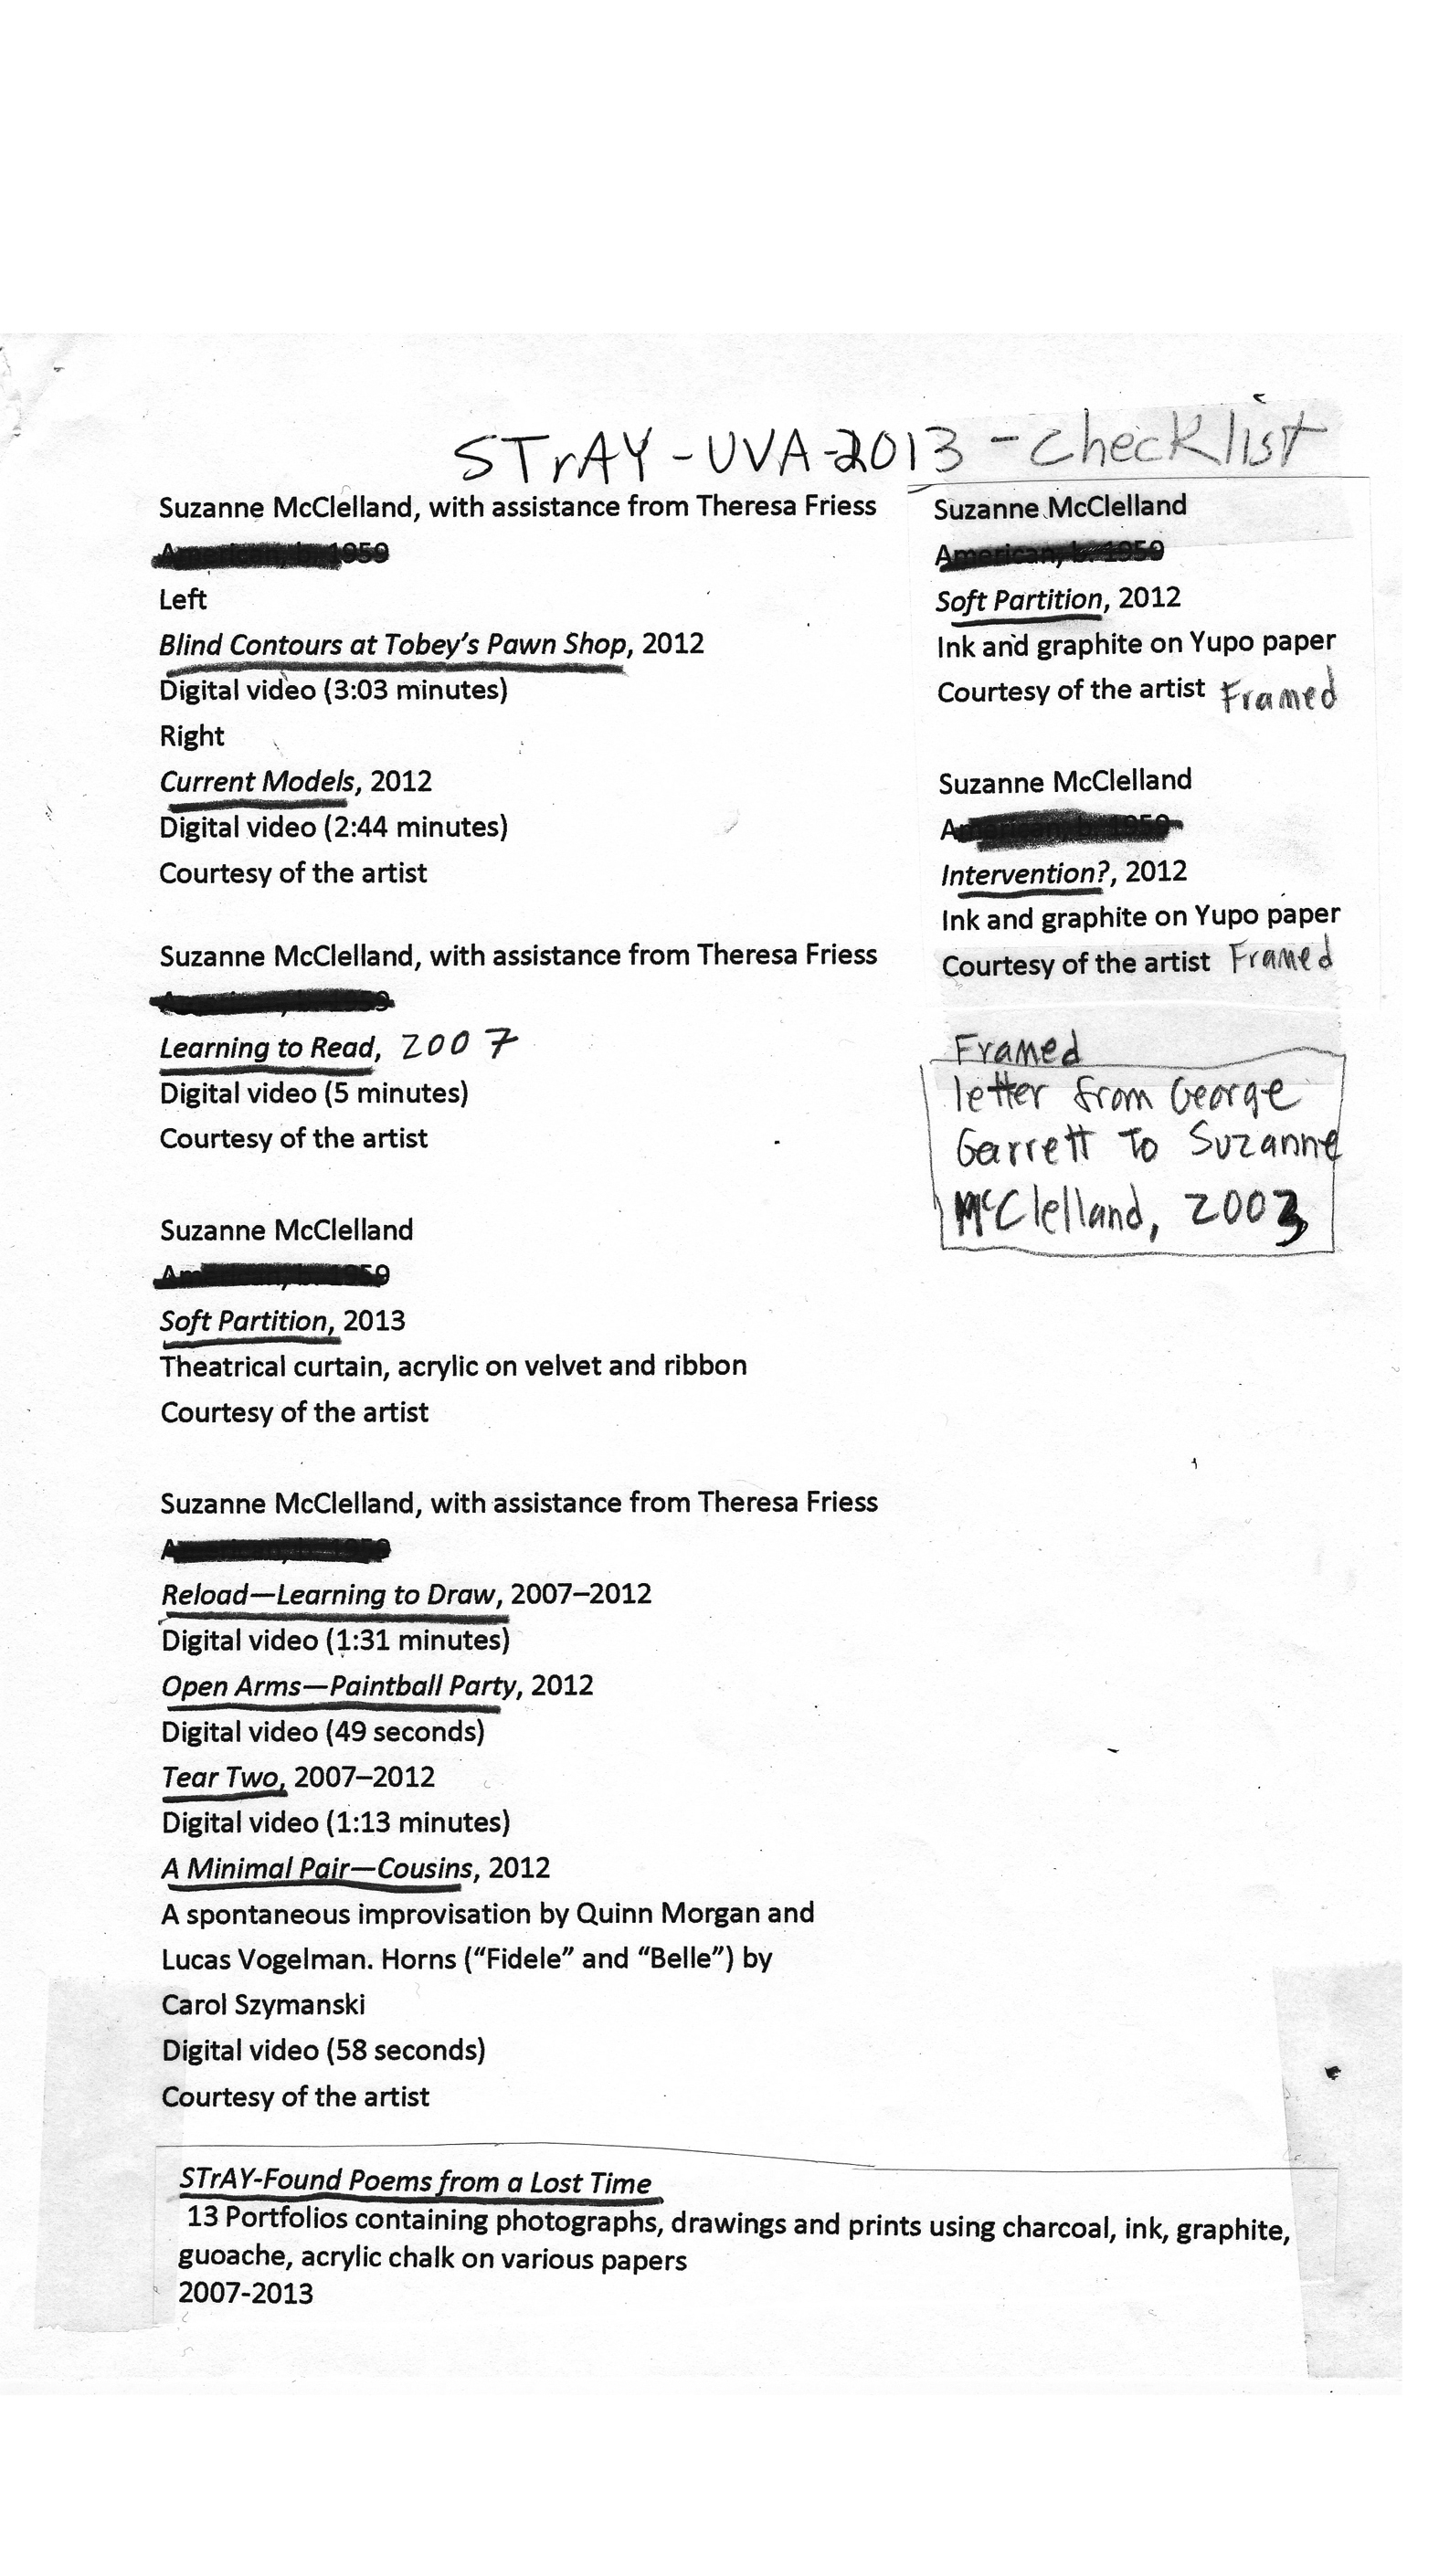 2013_Suzanne_McClelland_STrAY_catalog insert_Page_9.jpg